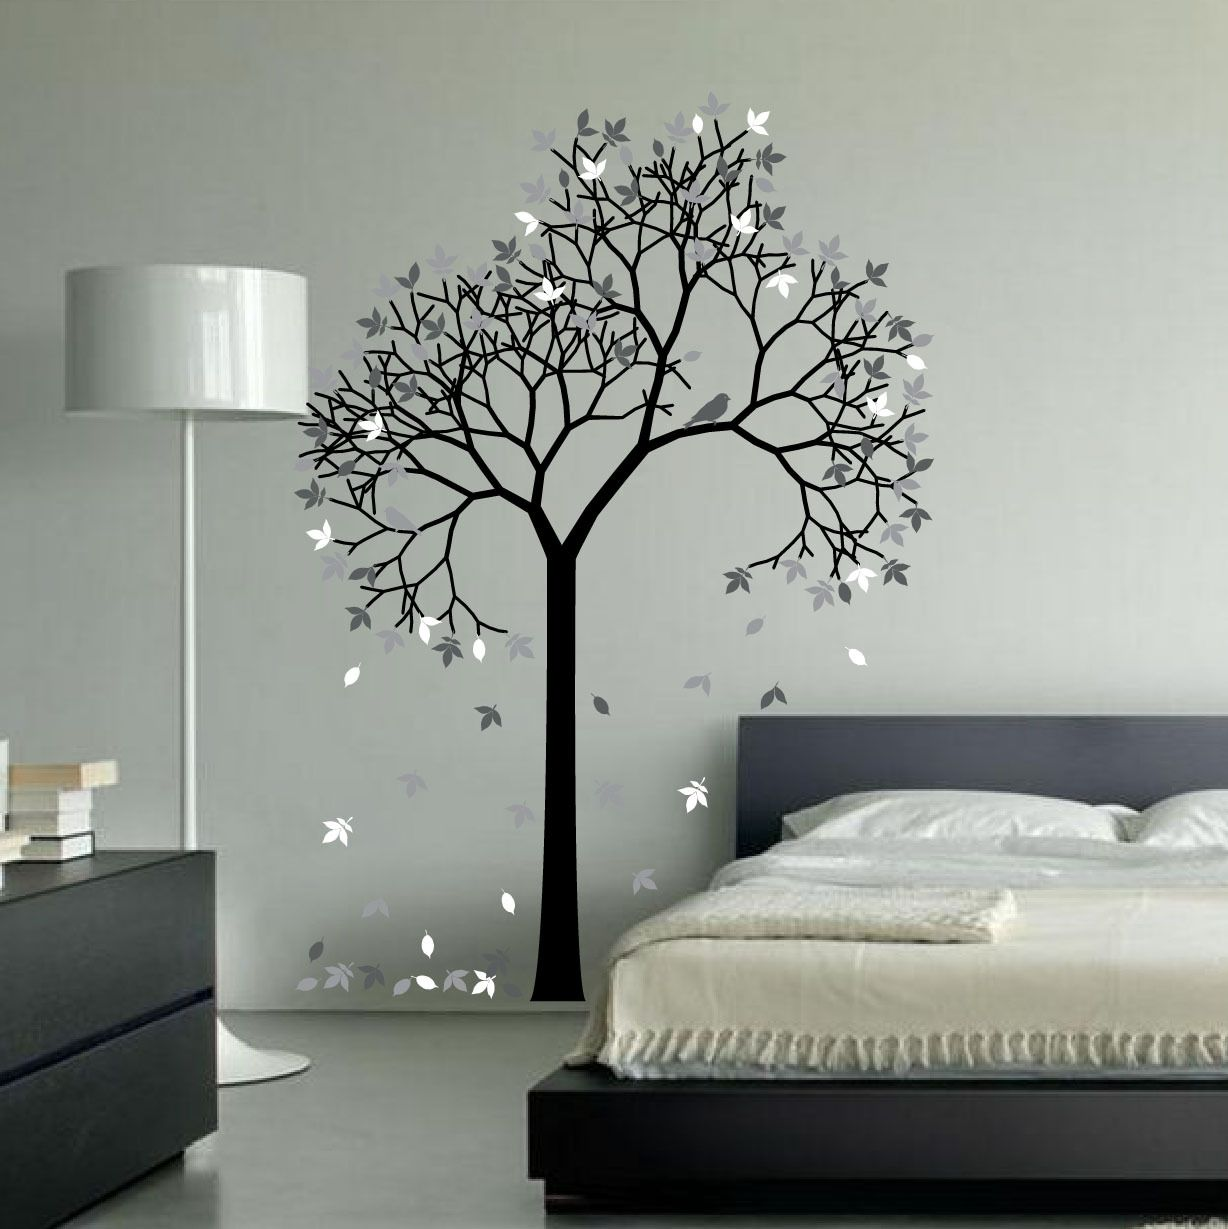 Aspen Tree Wall Decal Sticker Vinyl Nursert Art Leaves and